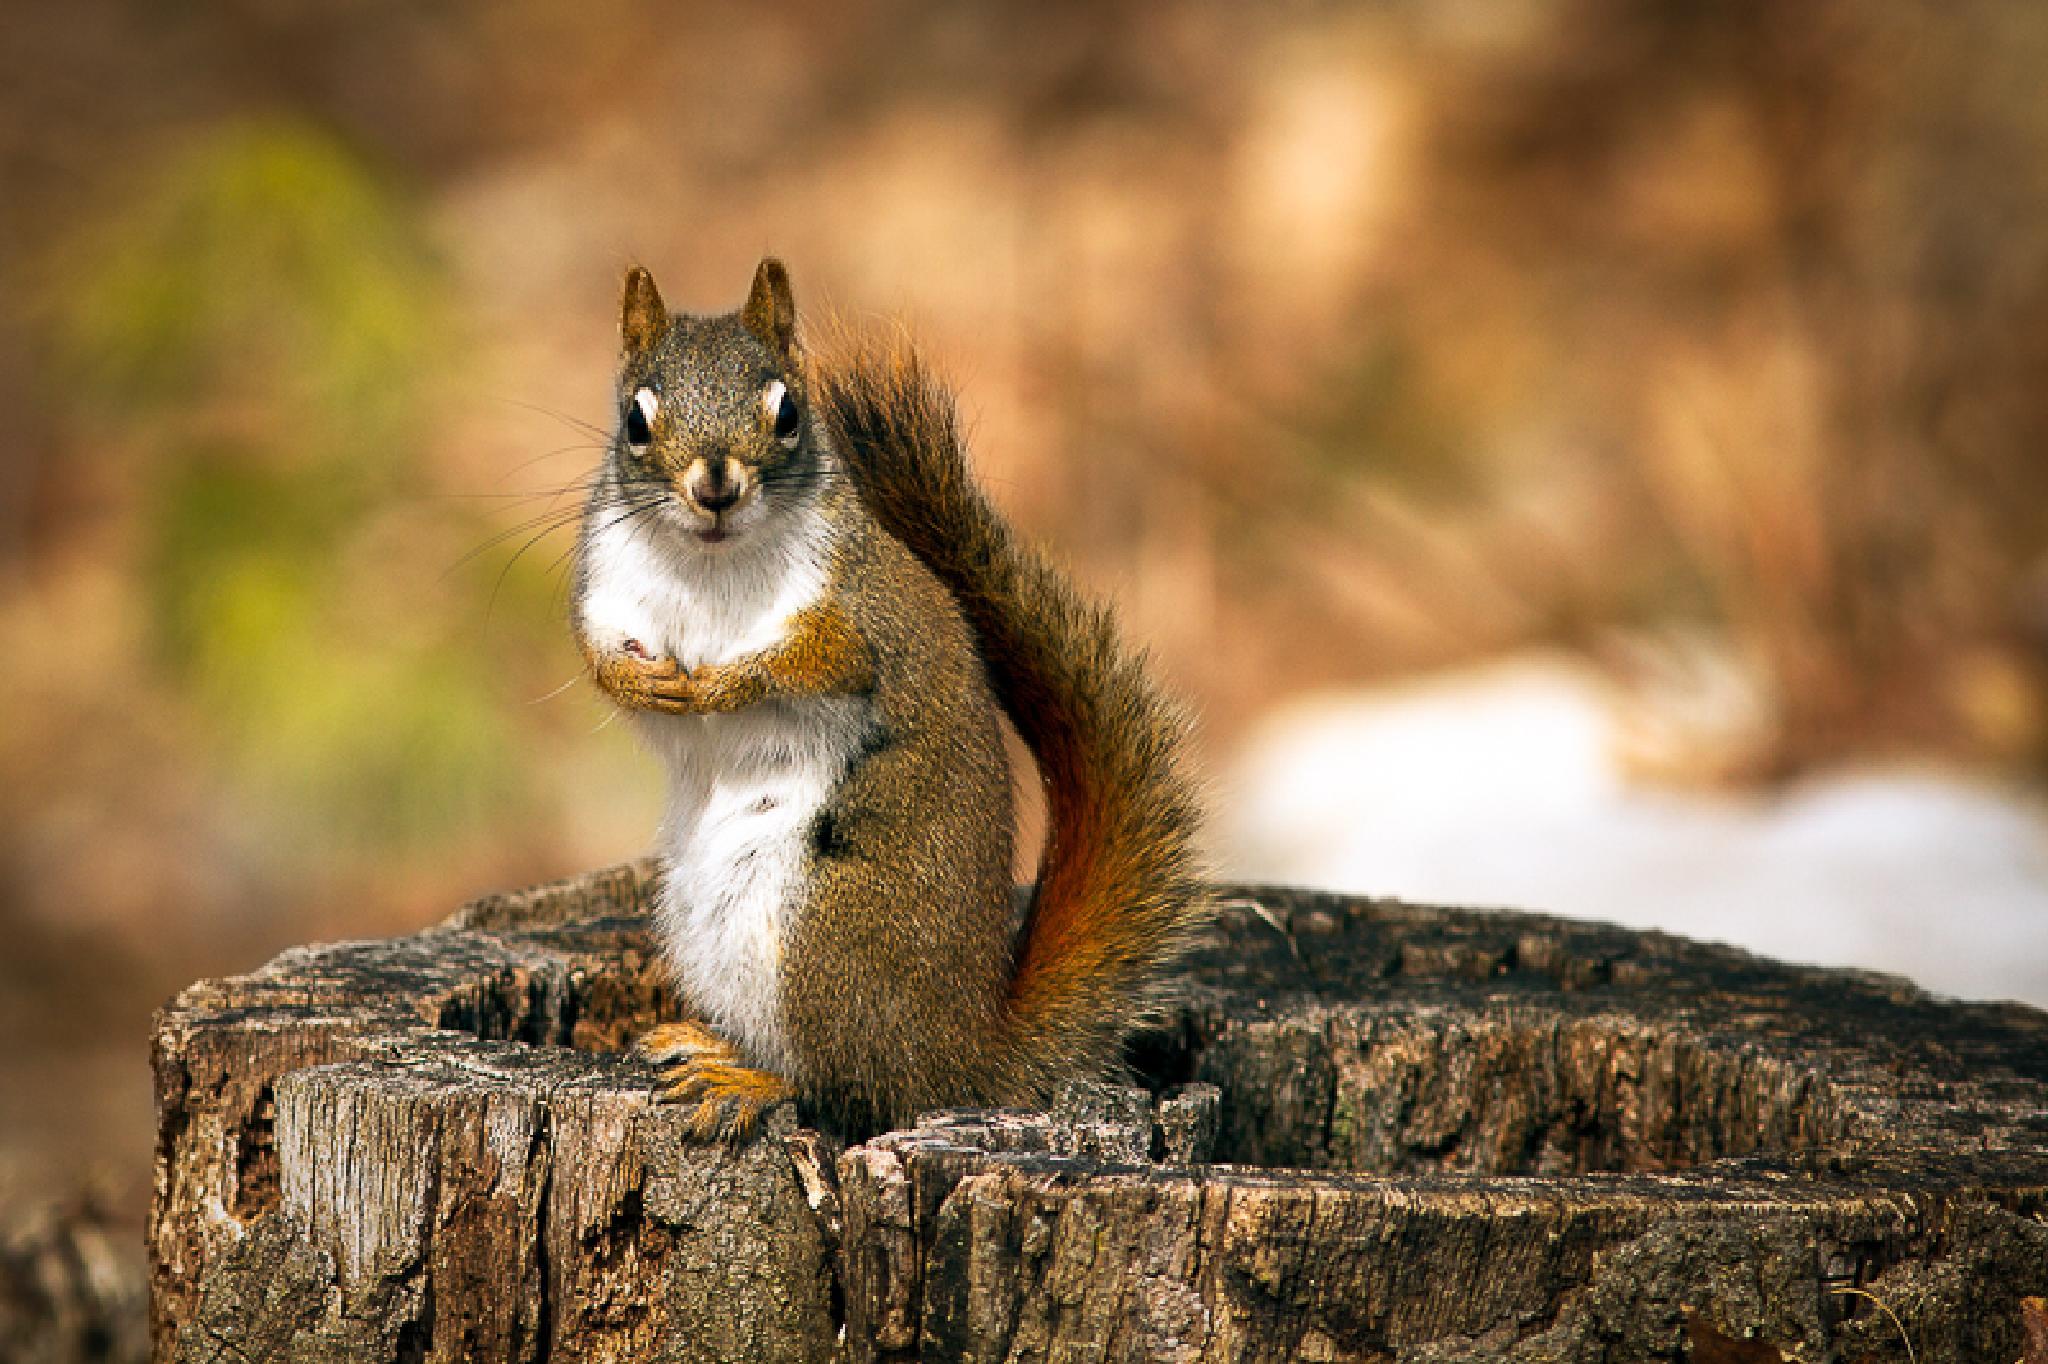 Red Squirrel by Robert Ferguson